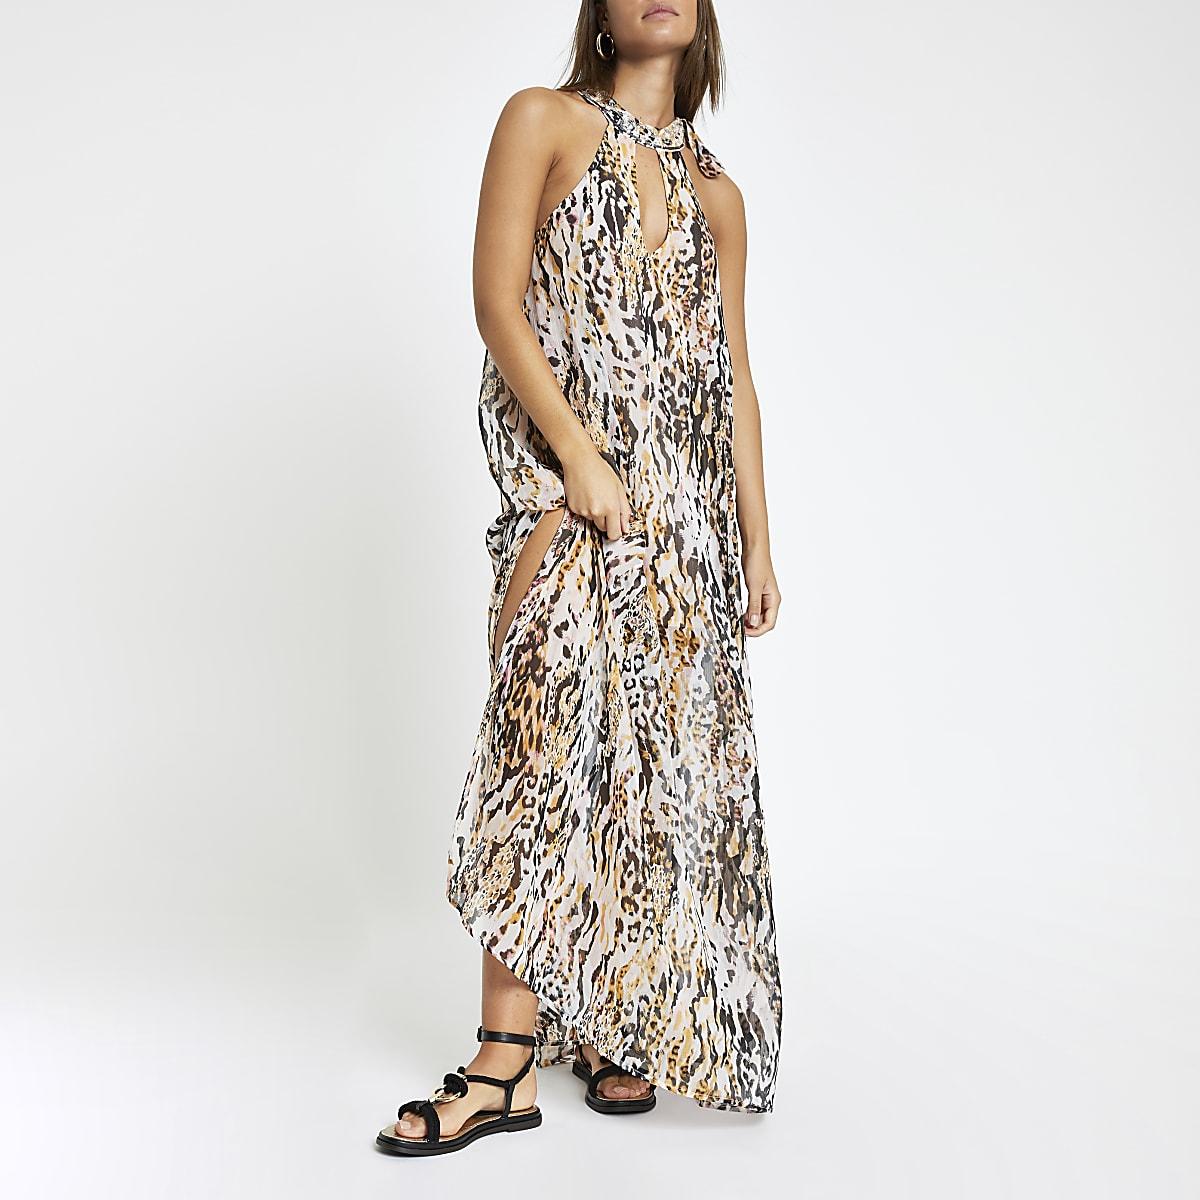 White animal print embellished beach dress